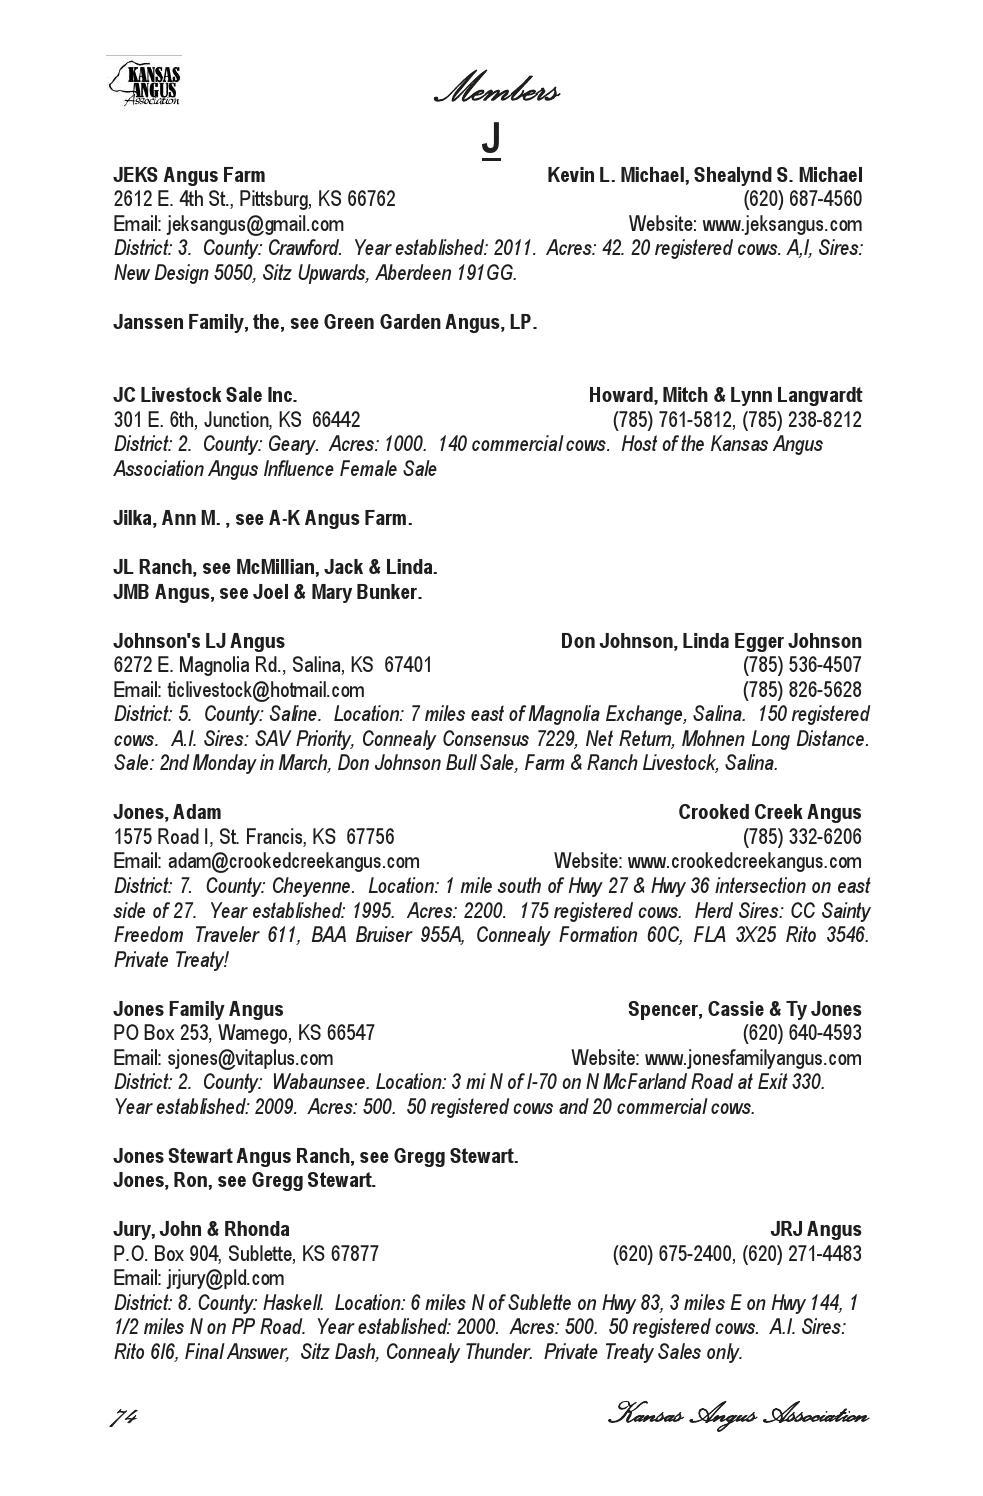 prezzo basso up-to-date styling trova il prezzo più basso Kansas Angus Association - 2014 Membership Directory by ...